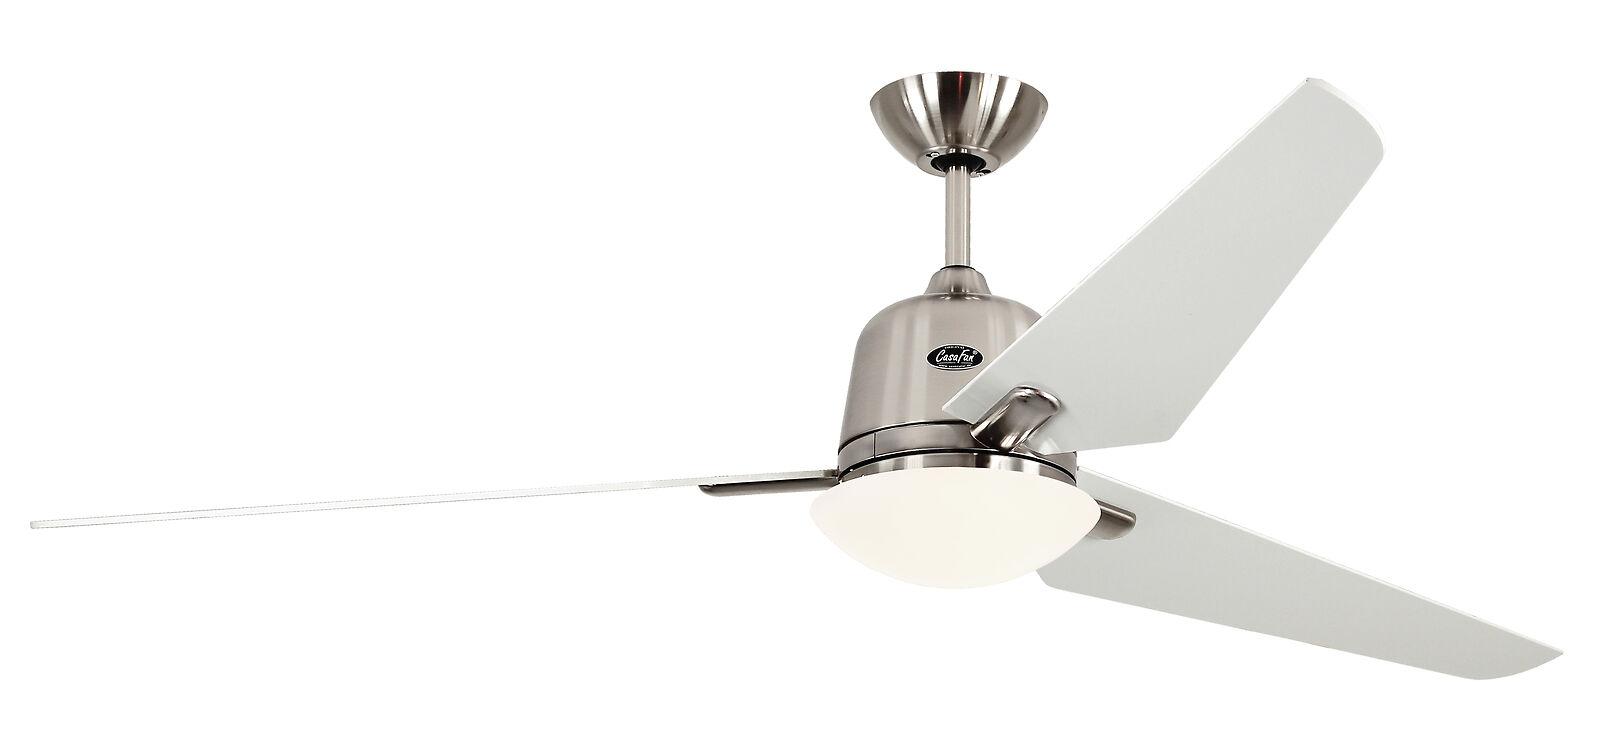 CasaFan ECO AVIATOS ceiling fan 162cm 516090 brushed chrome / white